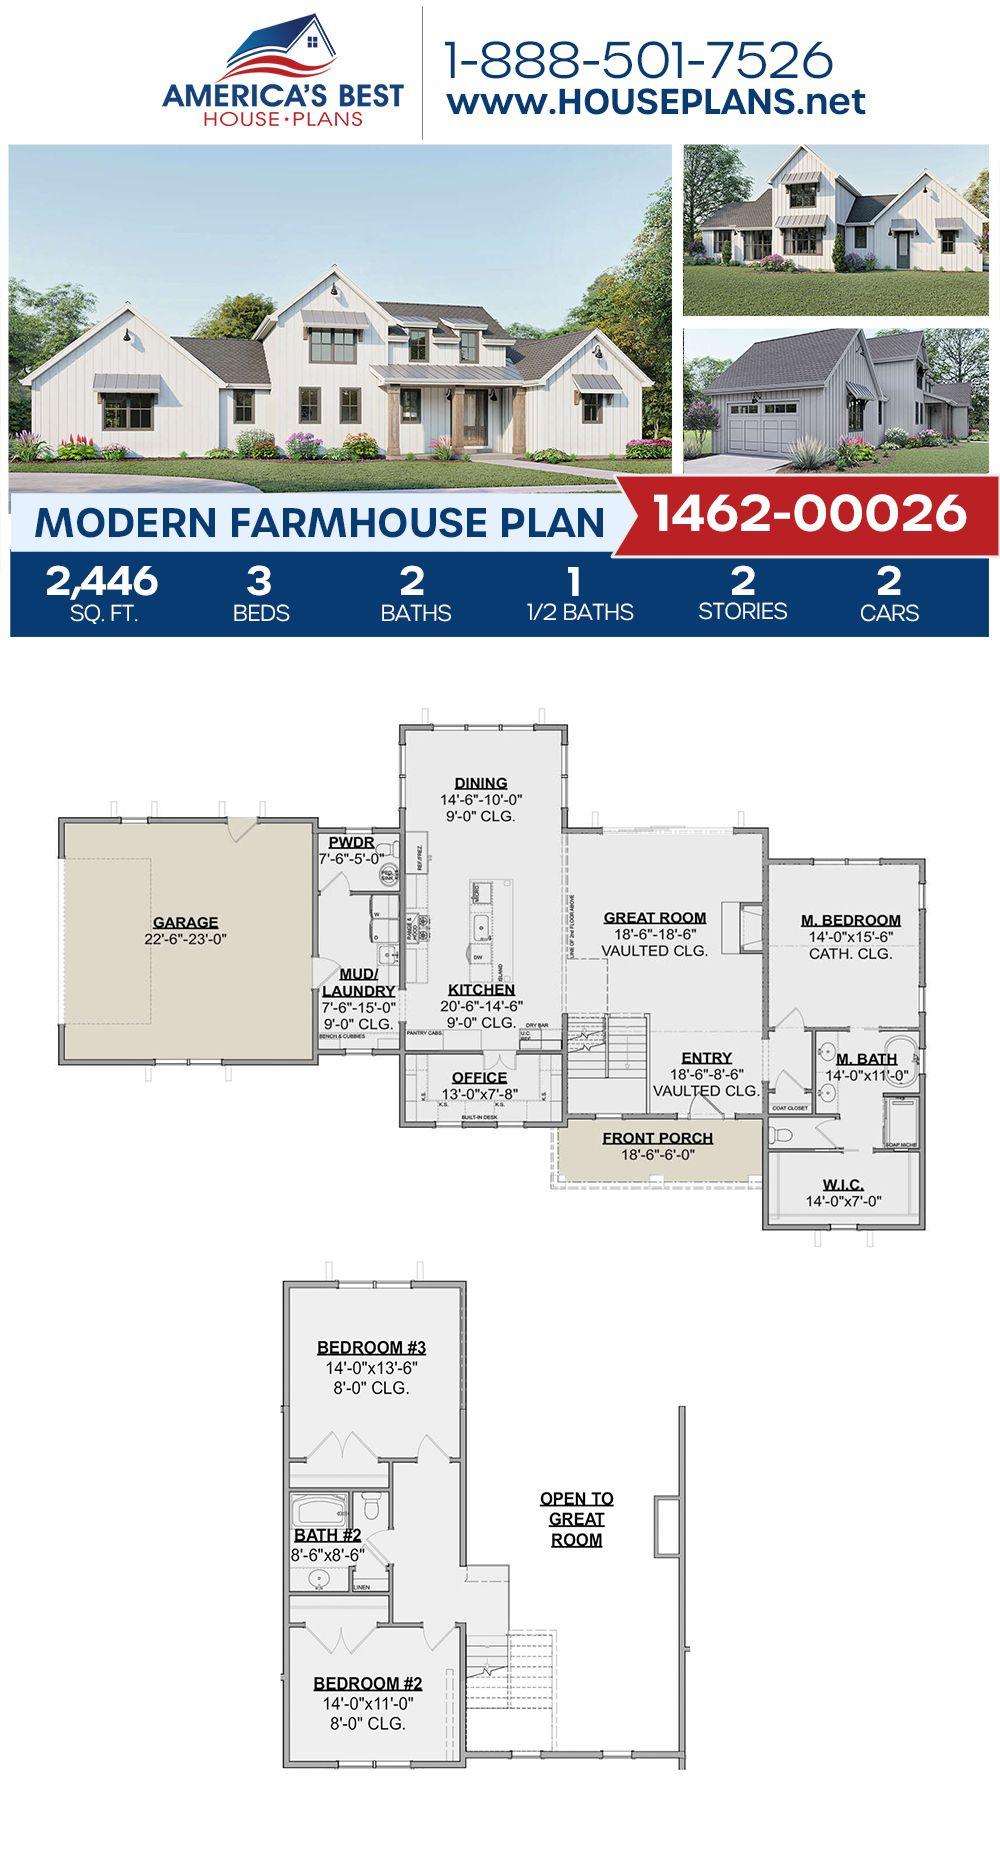 House Plan 1462 00026 Modern Farmhouse Plan 2 446 Square Feet 3 Bedrooms 2 5 Bathrooms In 2020 Modern Farmhouse Plans Farmhouse Plans Exclusive House Plan